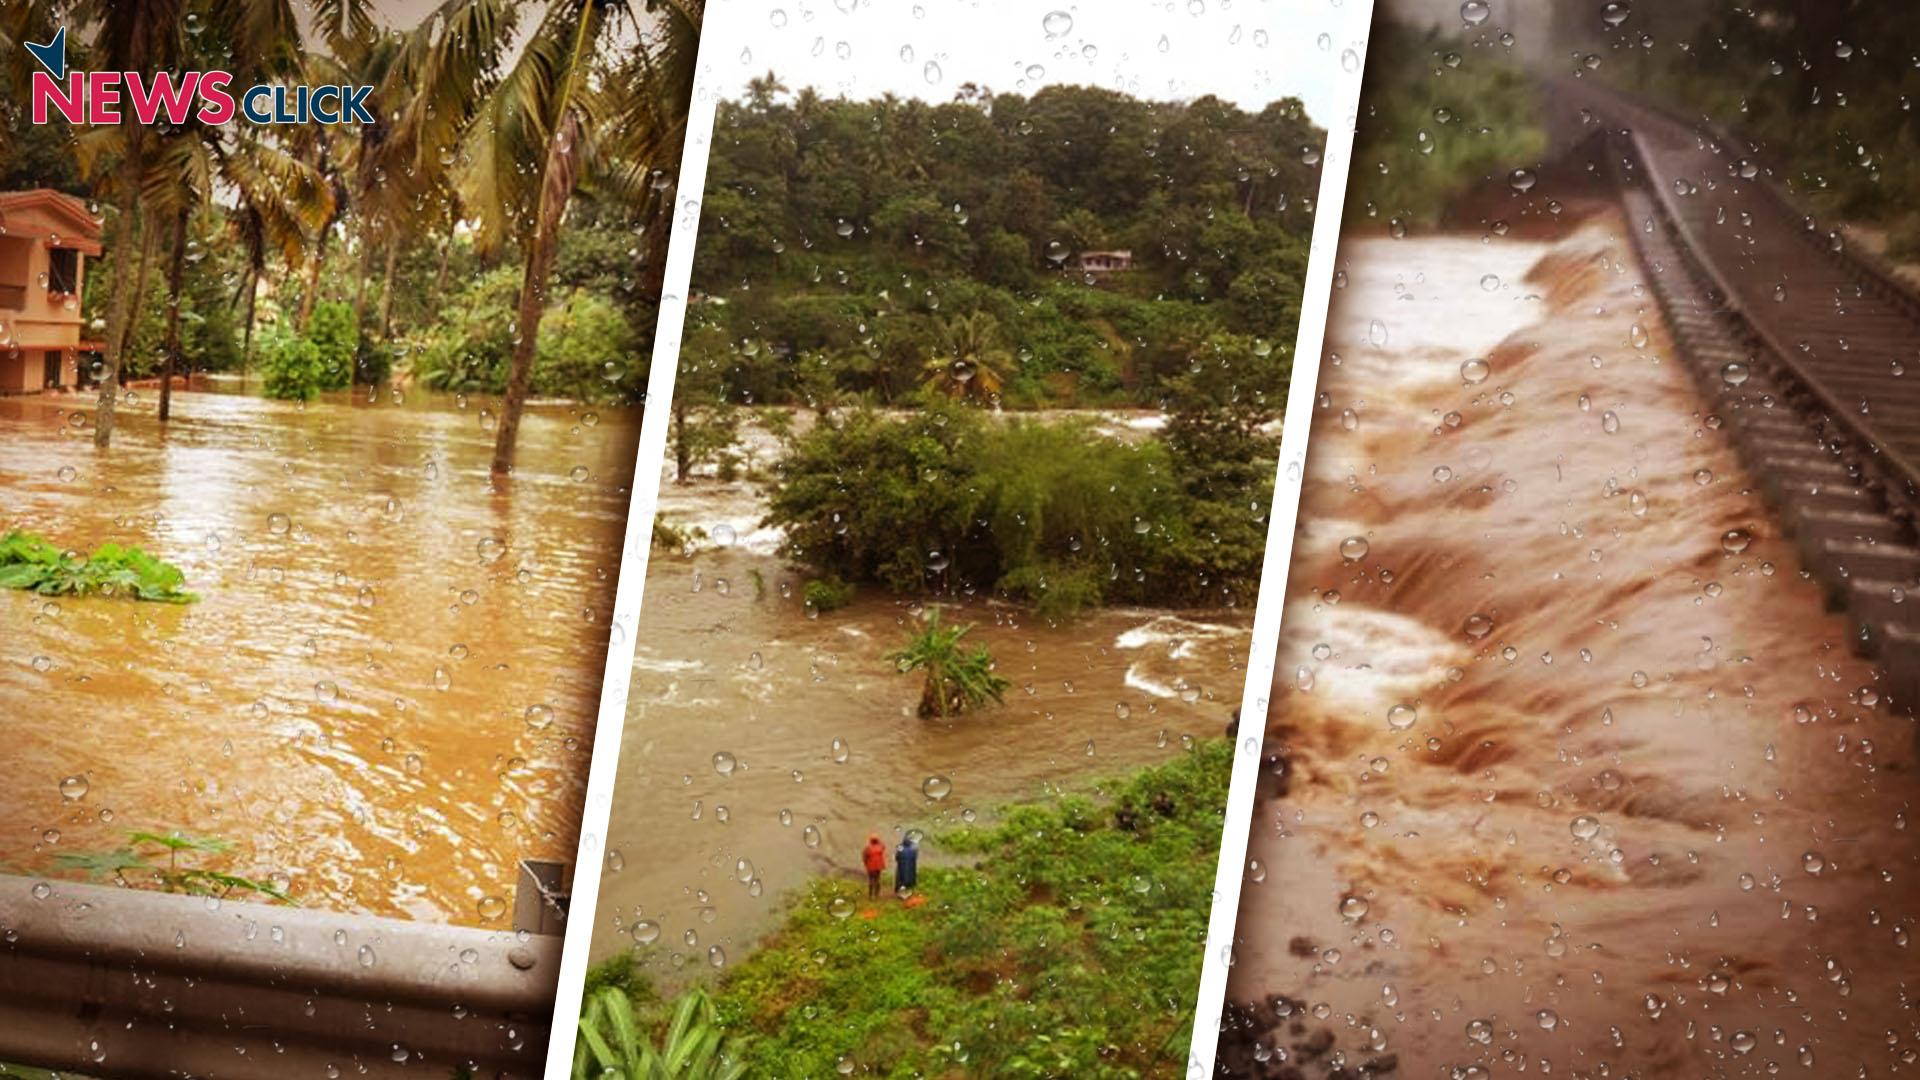 kerala floods 255 excess rainfall in one week newsclick